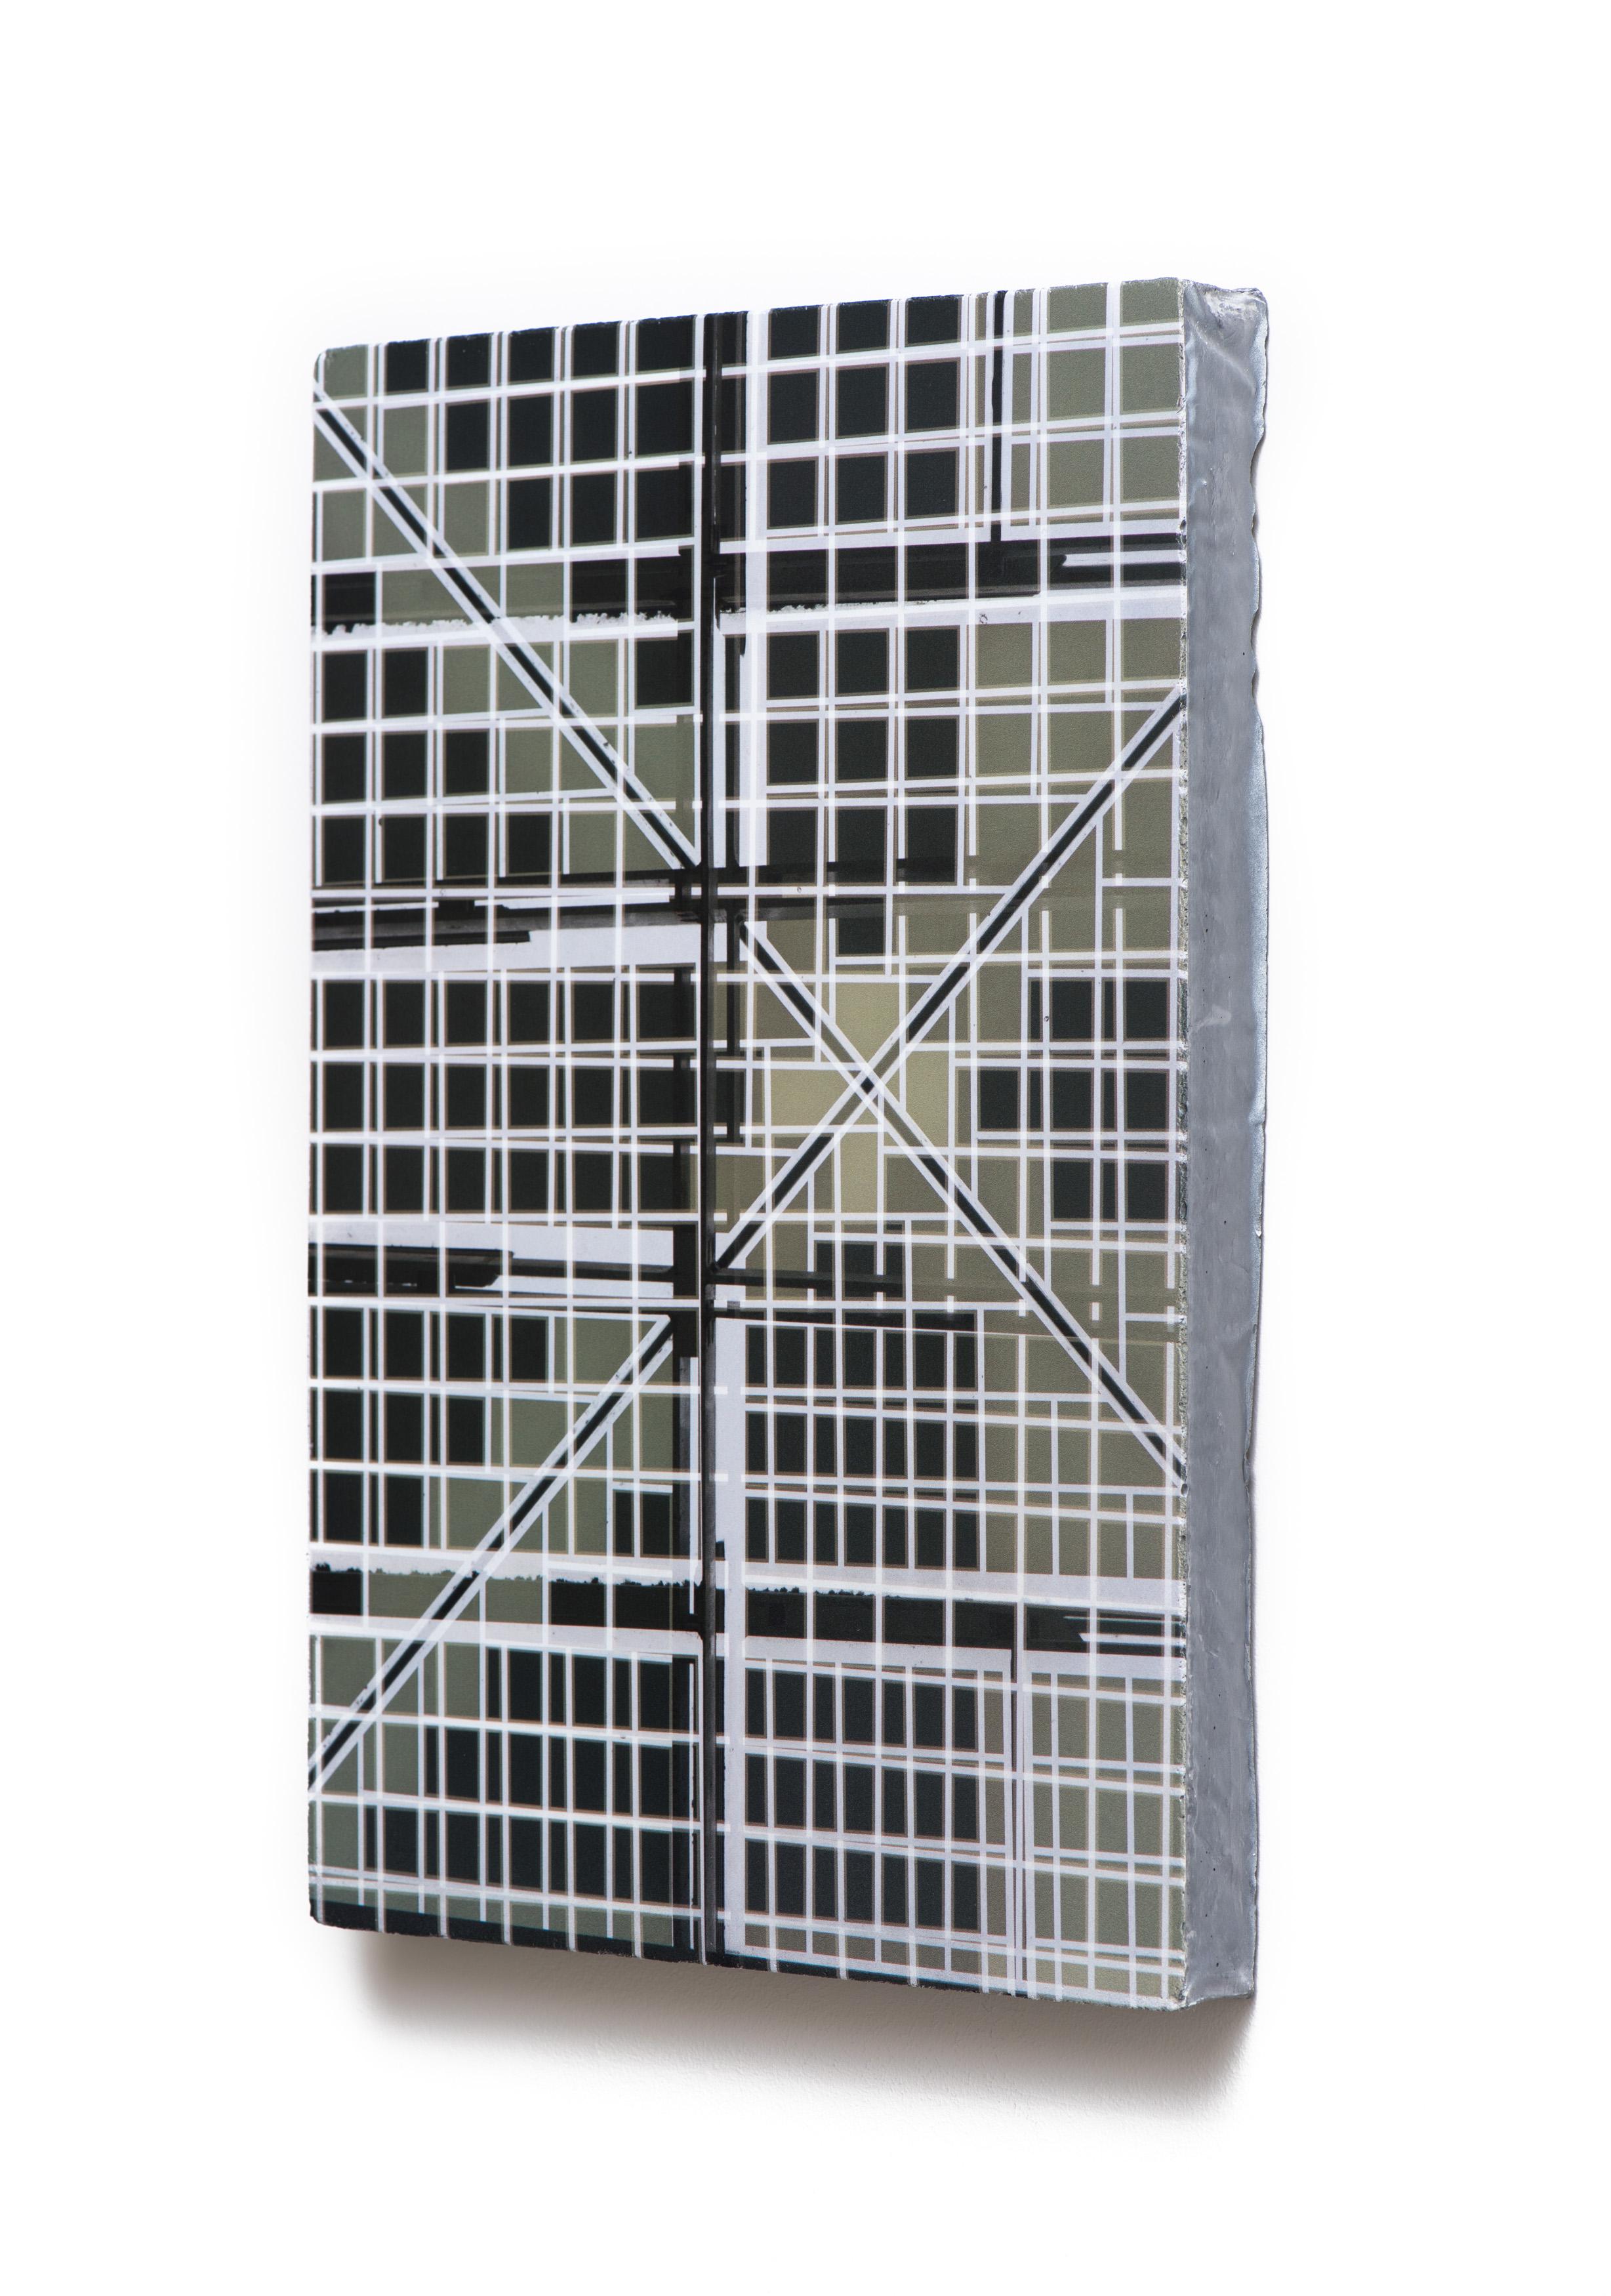 Counterform Intersection, 2017 (oblique) UV ink on concrete 18 1/2 × 12 1/2 × 1 1/2 in Unique